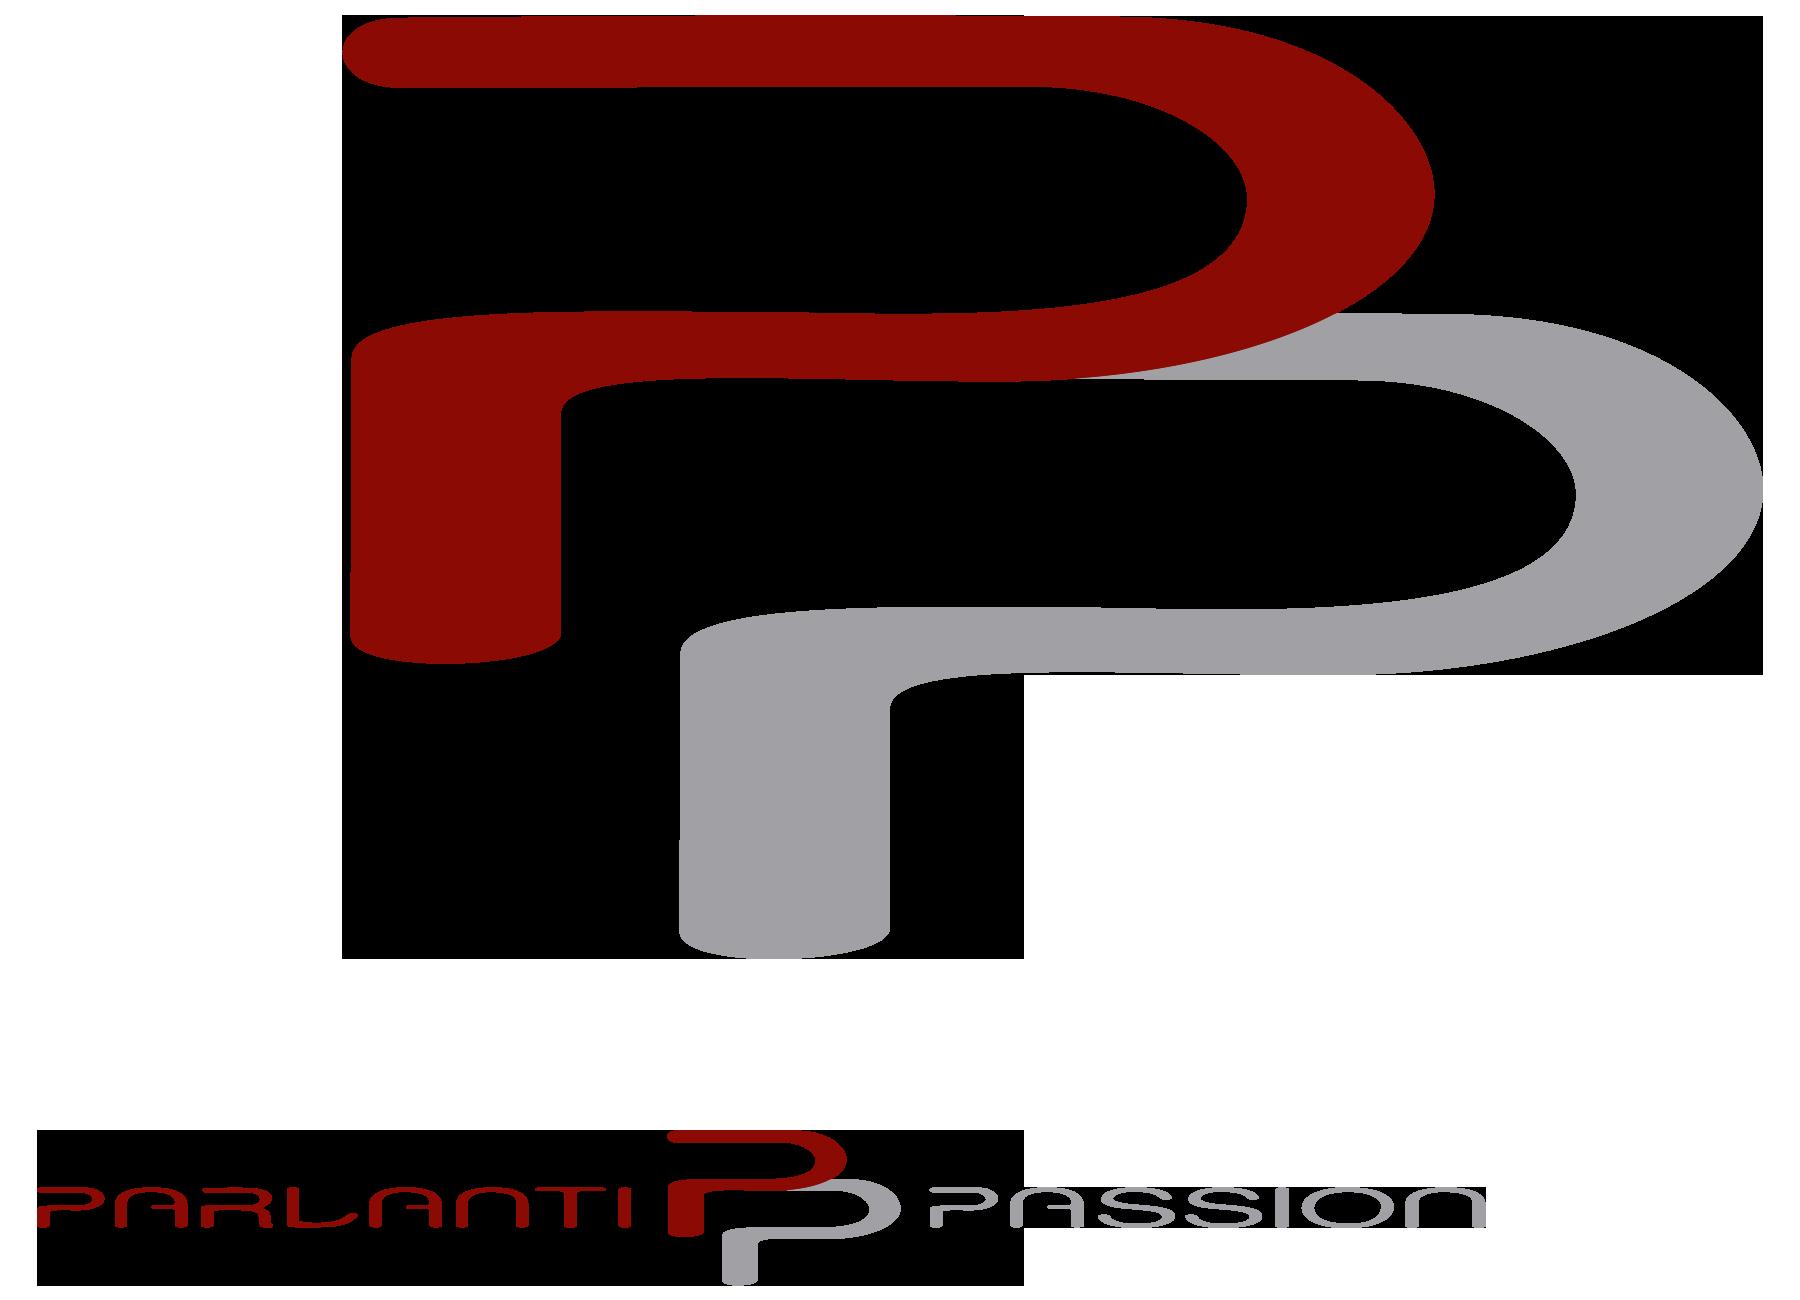 Parlanti_Passion_logo_150px